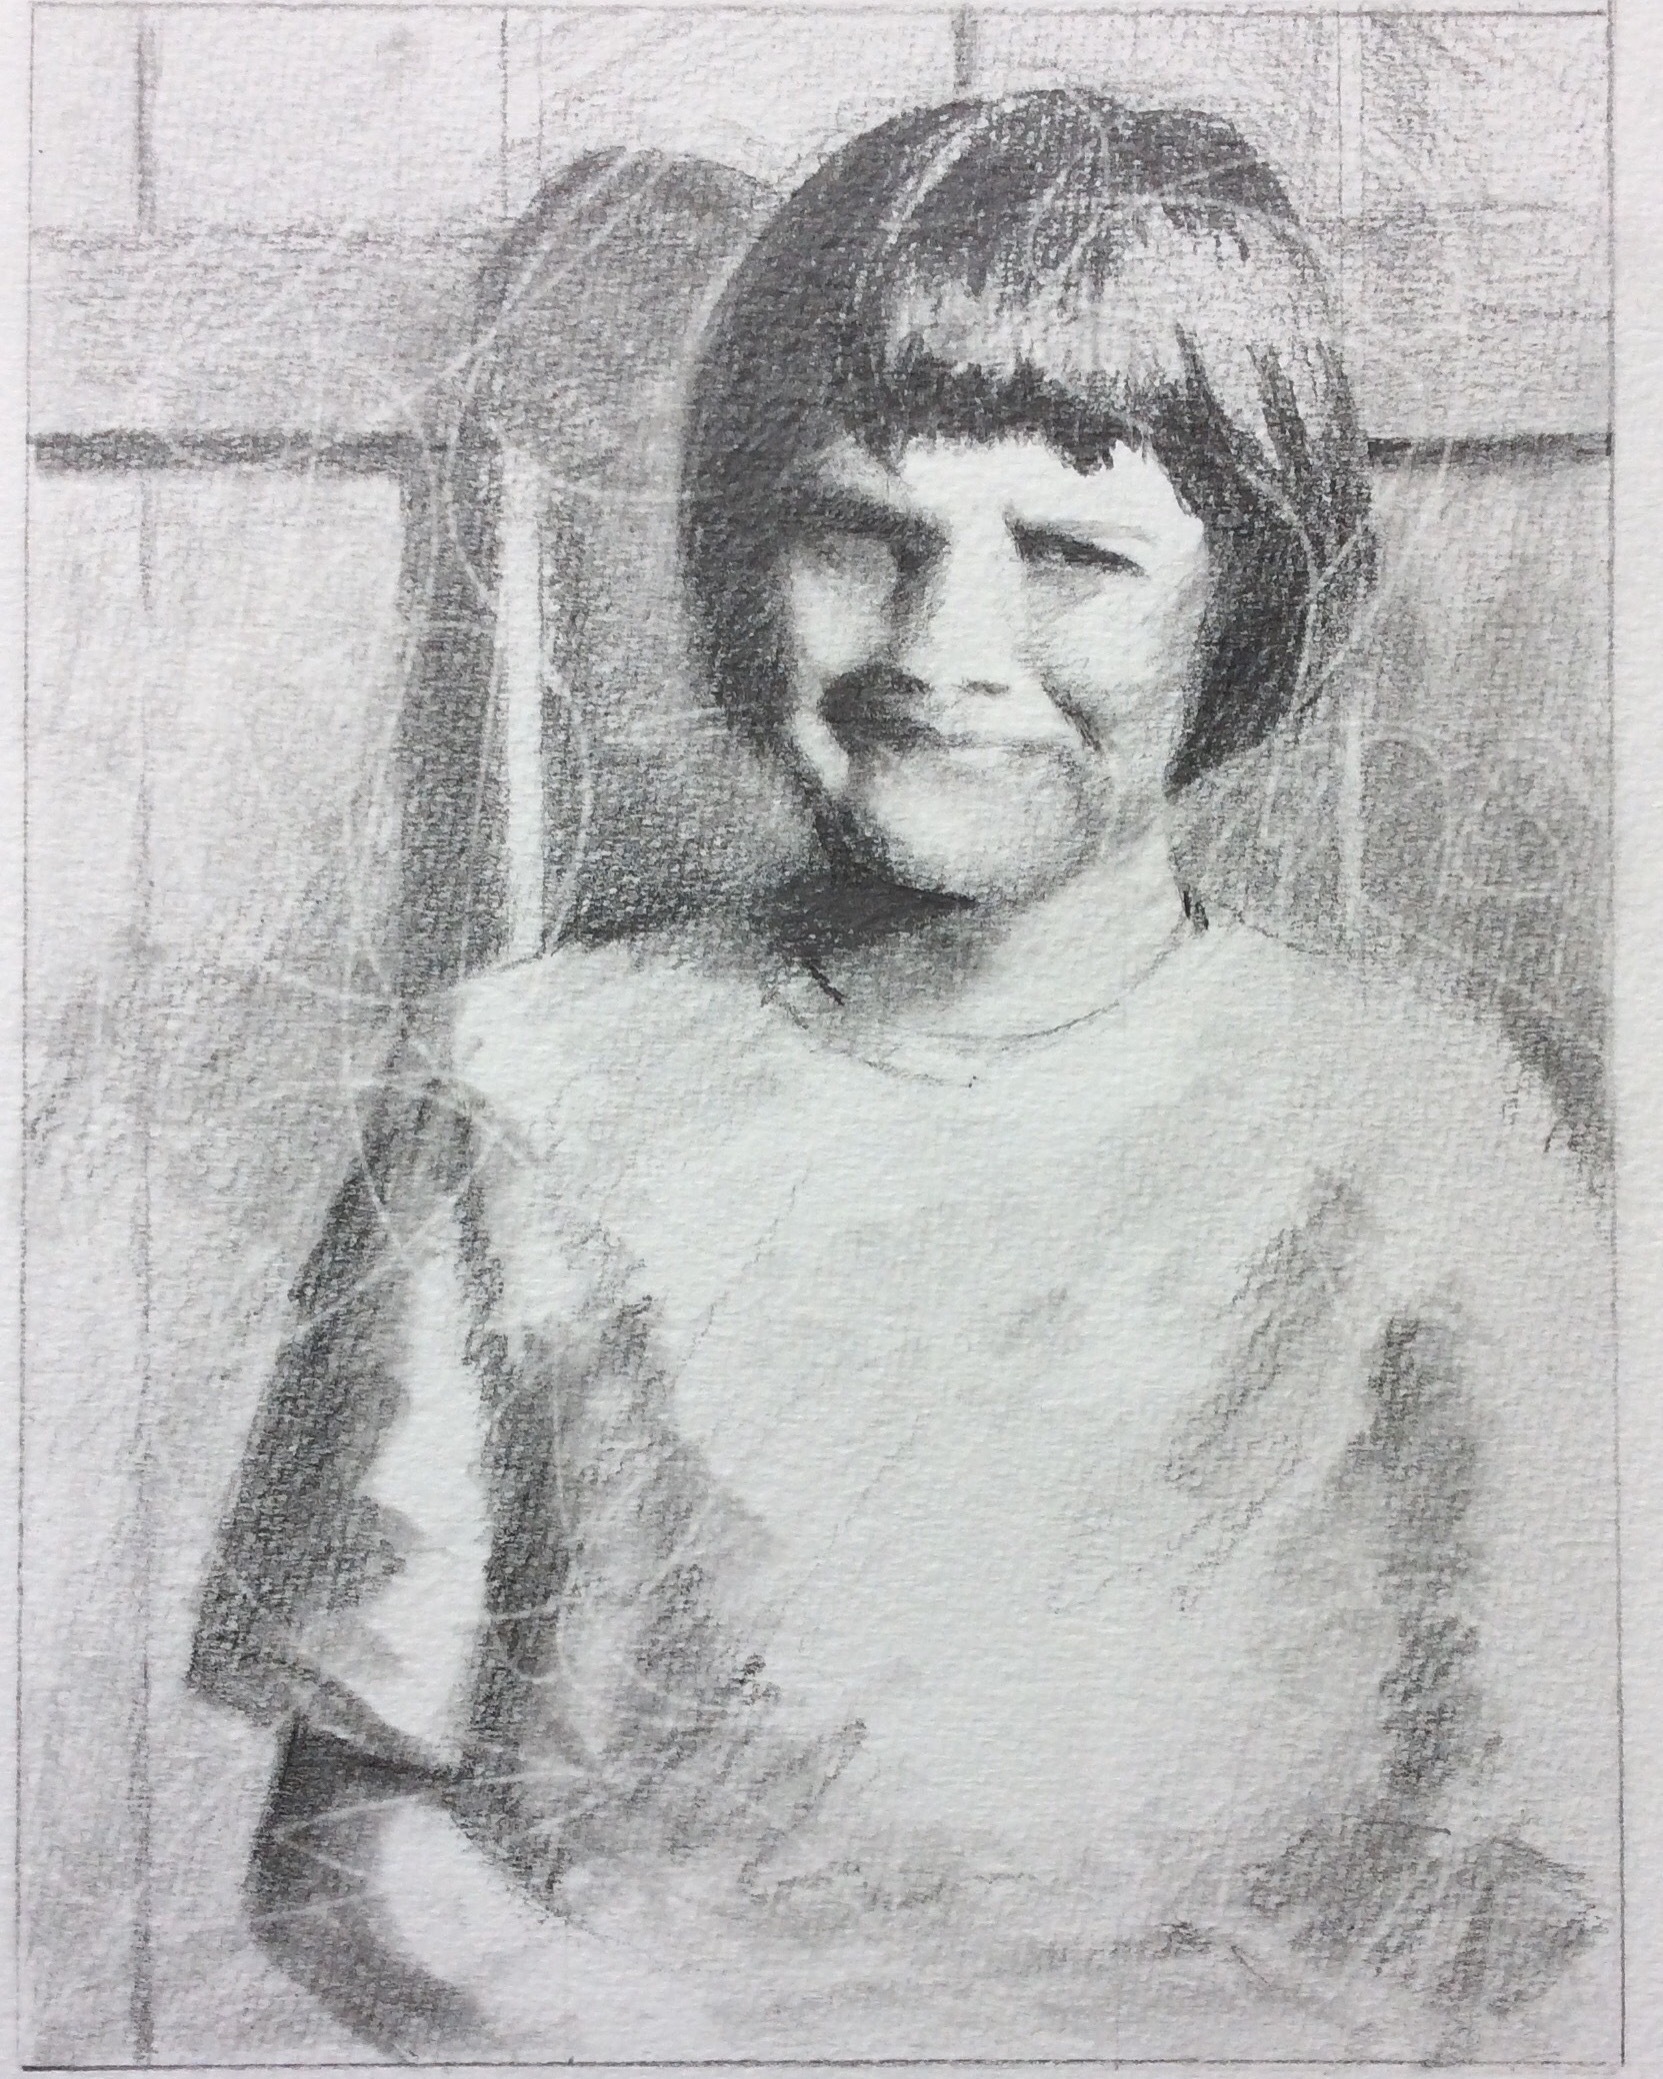 """Susan Morrison, May 1968, Thunder Bay"" Art journal, pencil"